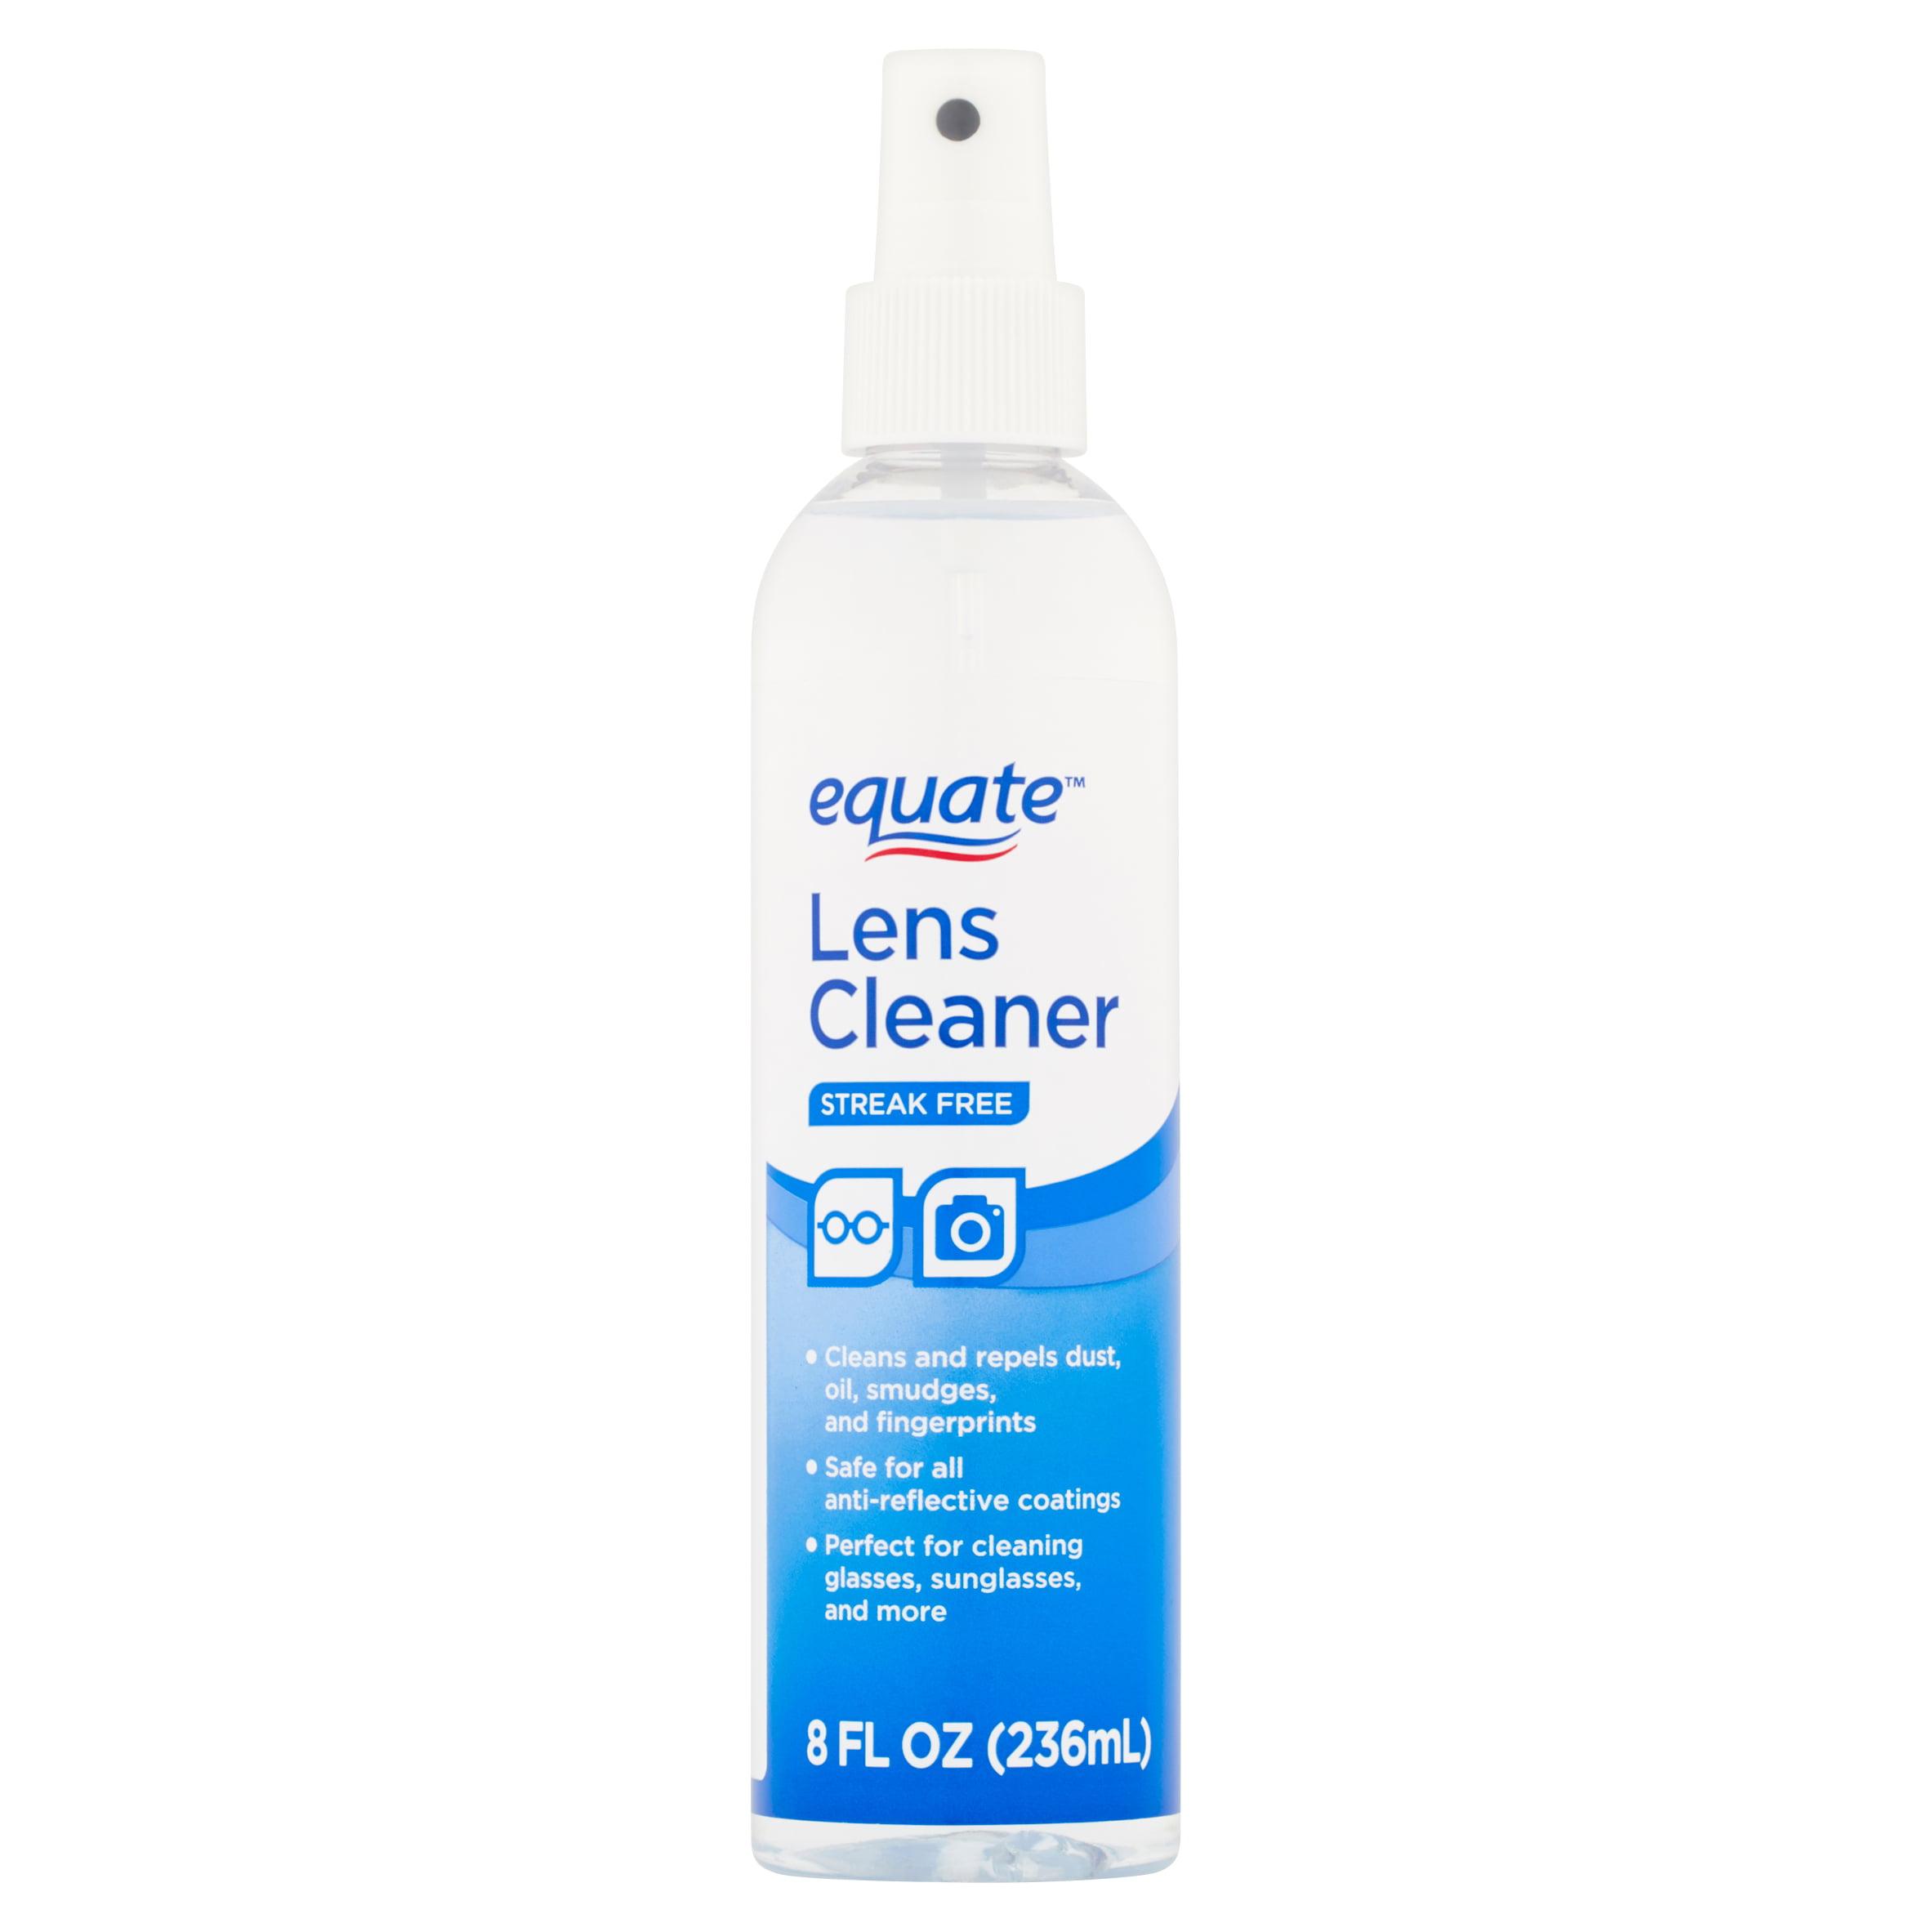 e825cfd8037 Equate Streak Free Lens Cleaner